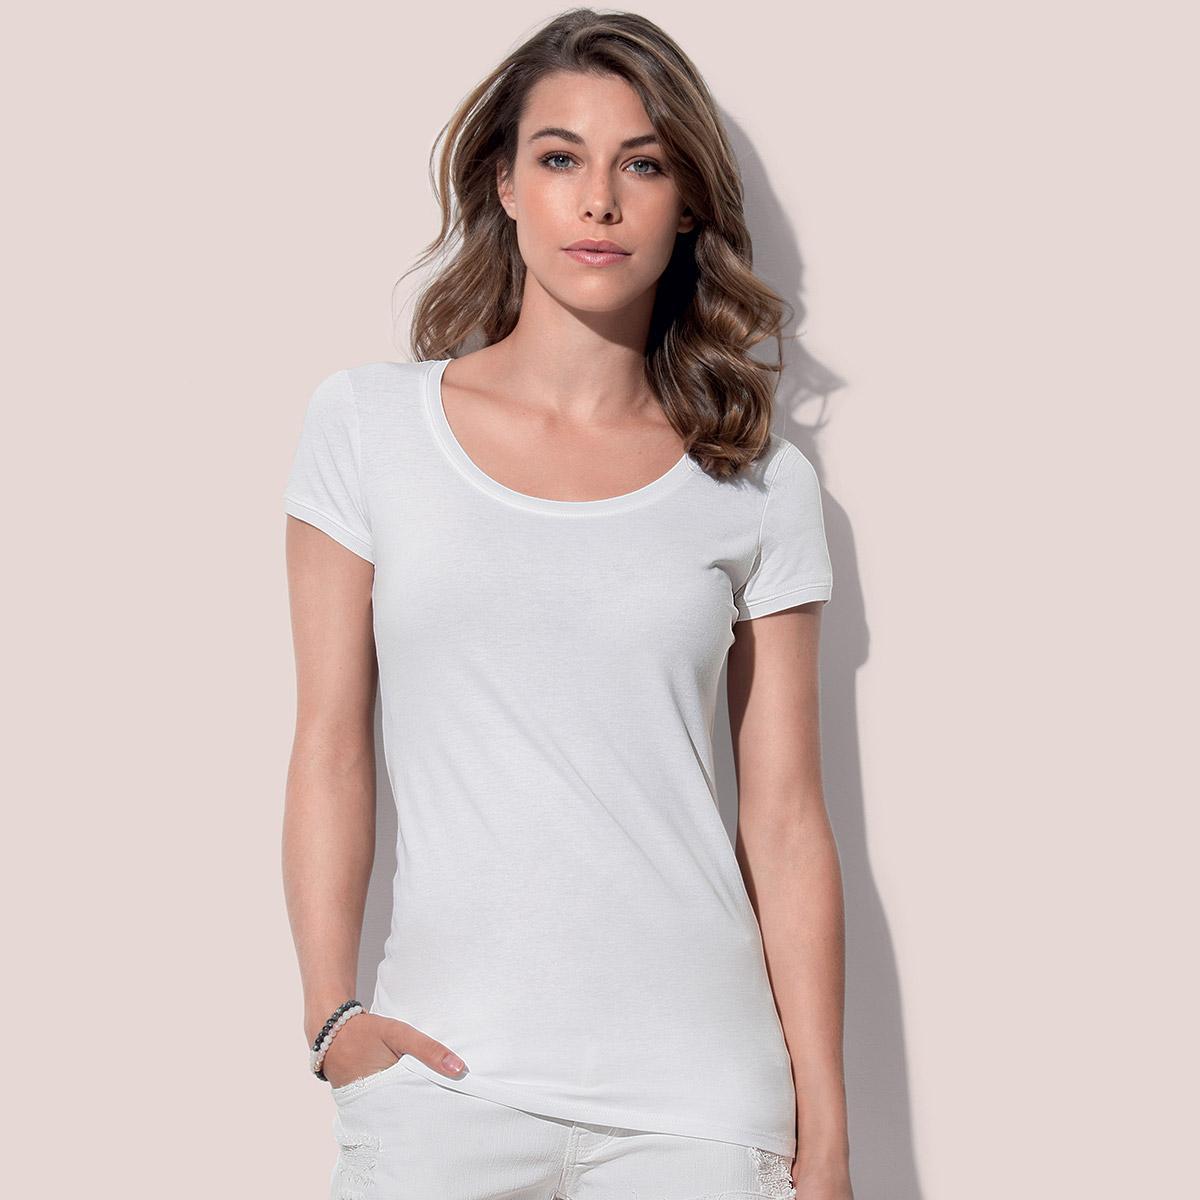 You are currently viewing t-shirt personalizzate : Ecco 5 consigli e idee a riguardo